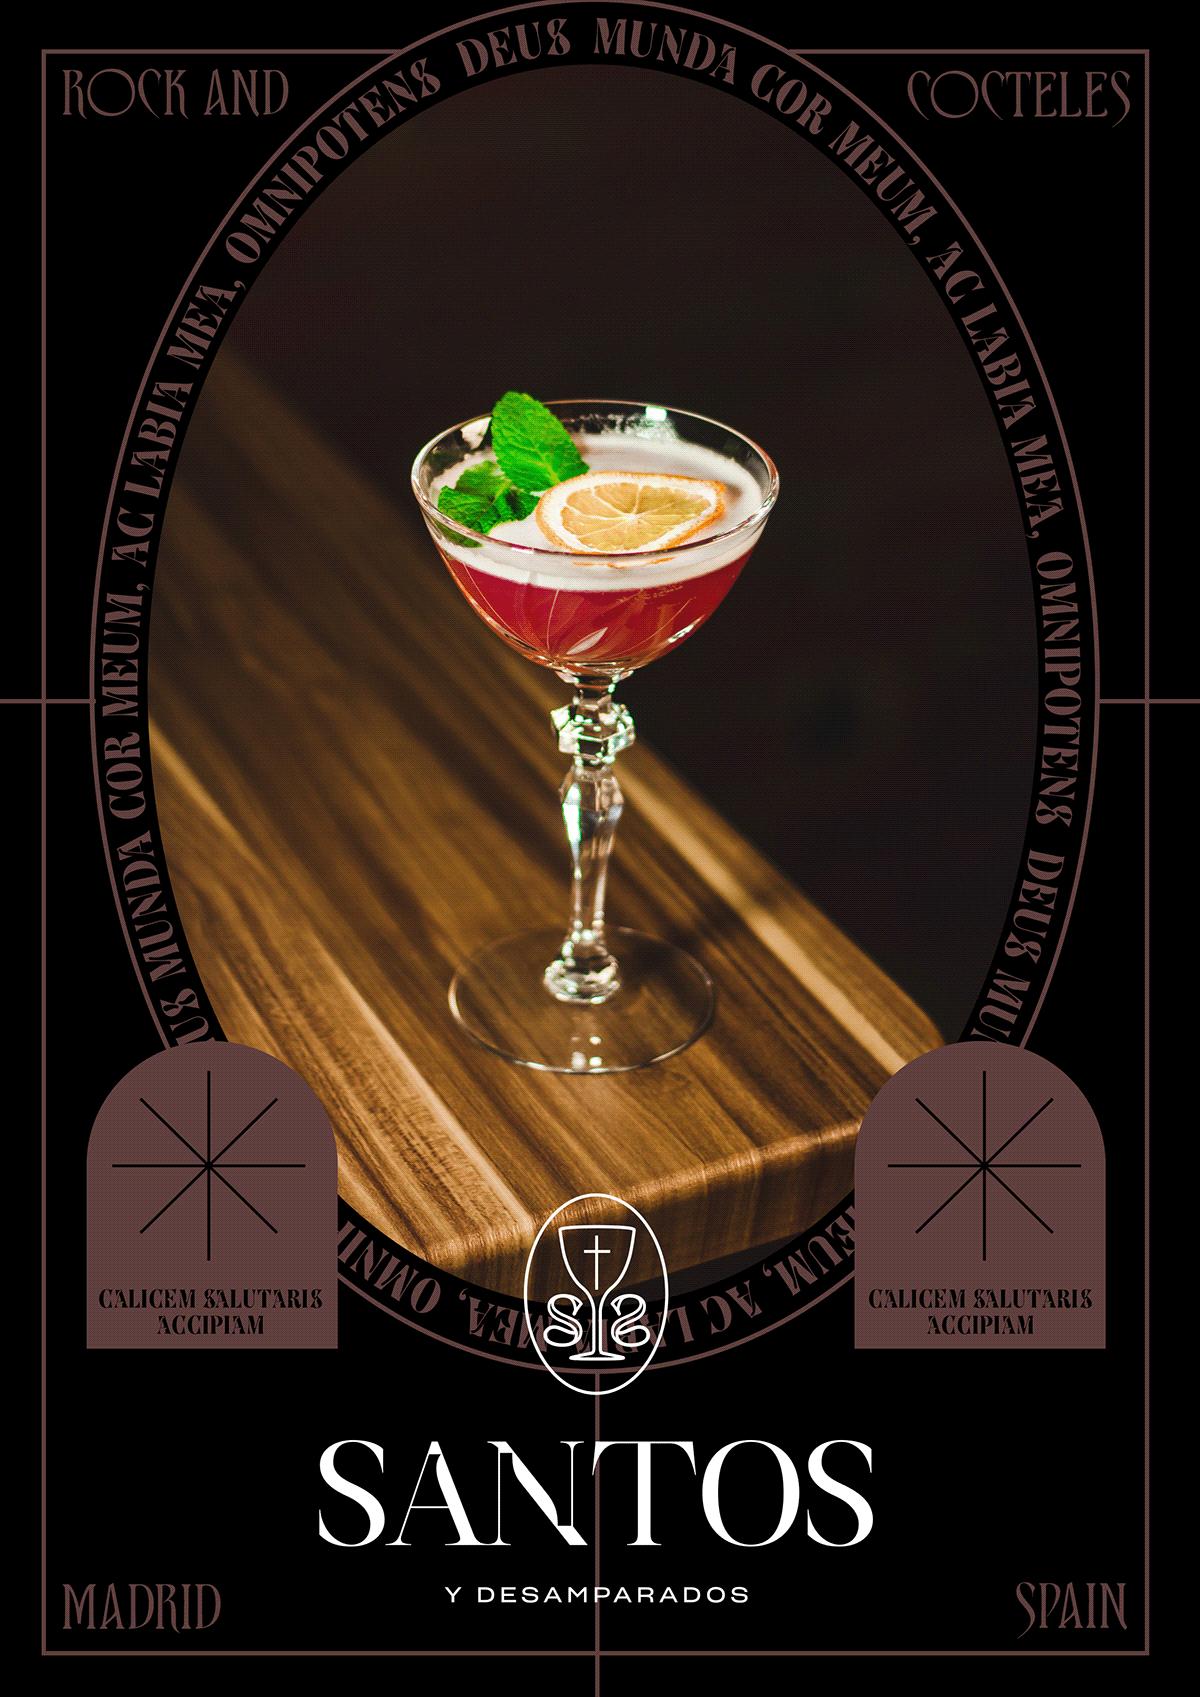 bar,bran,club,cocktail,elegant,goth,identity,restaurant,rock,trends